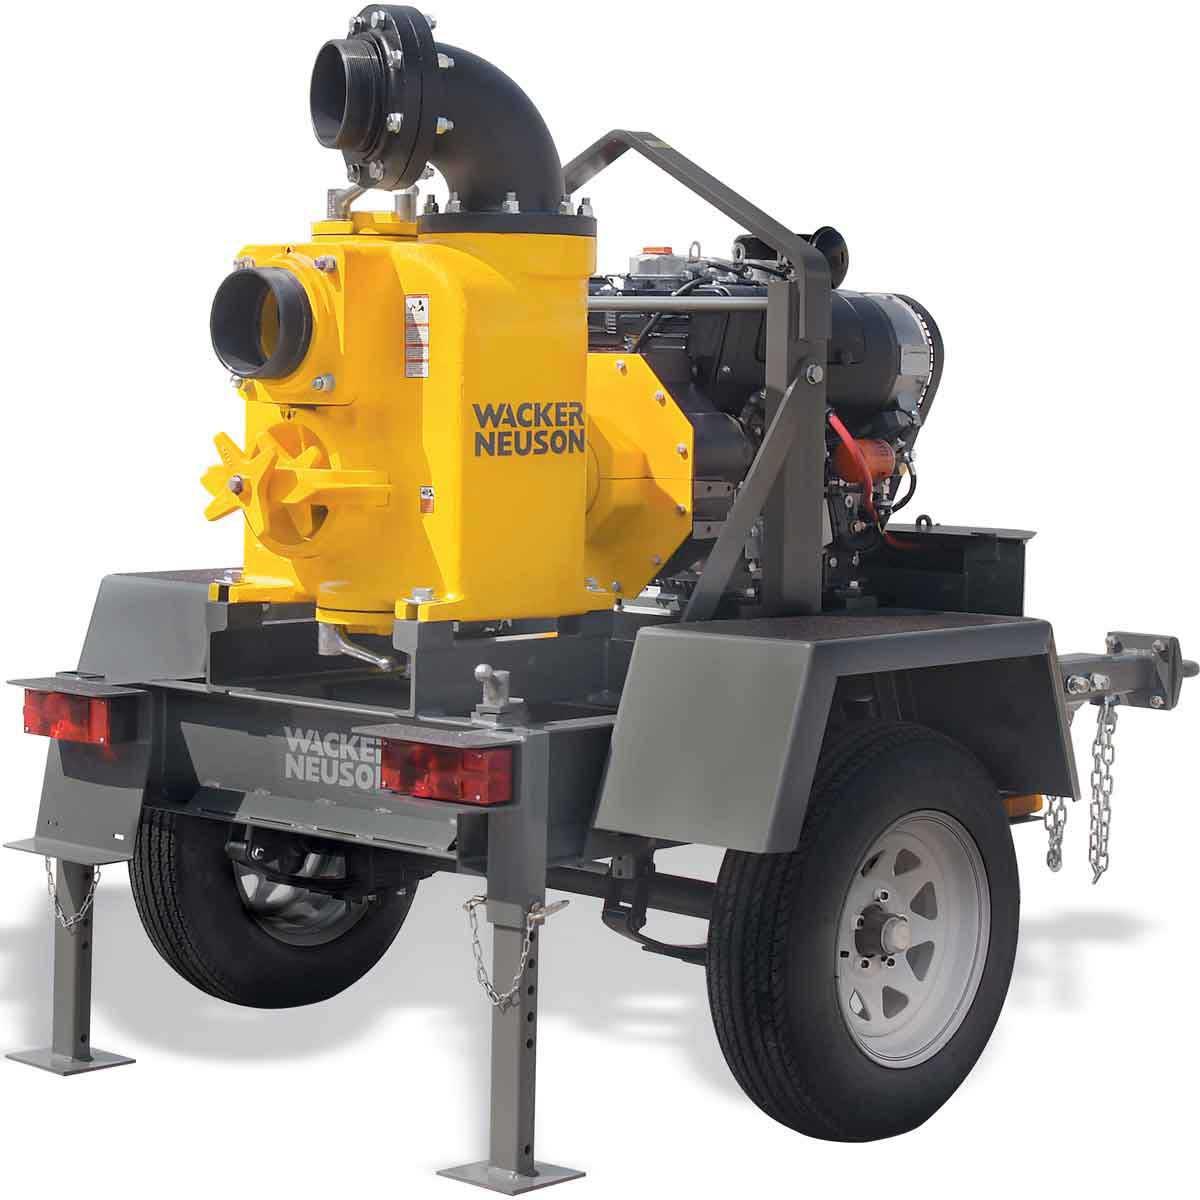 6 inch Trash Pump Wacker Neuson